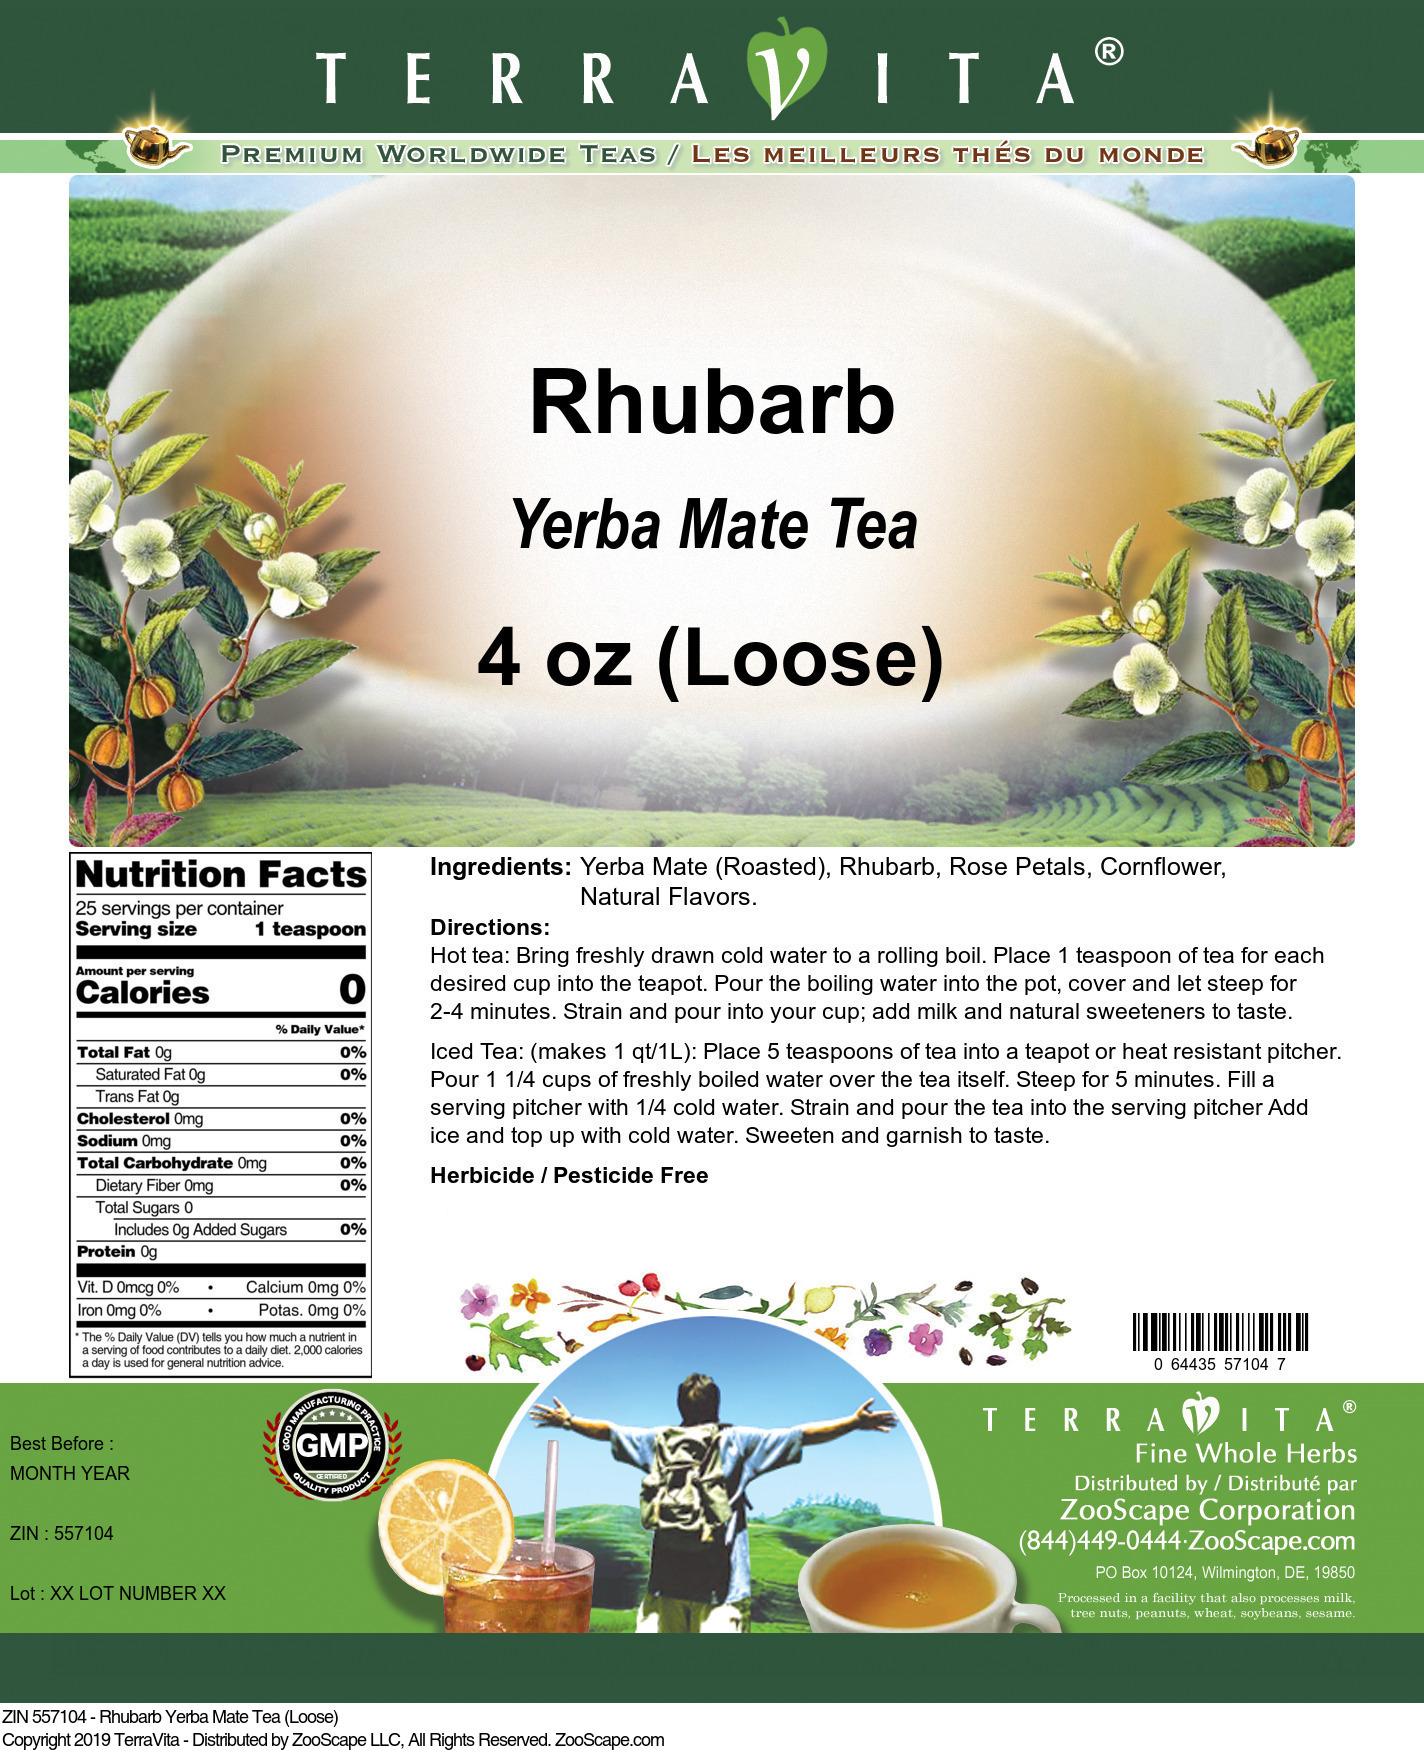 Rhubarb Yerba Mate Tea (Loose)